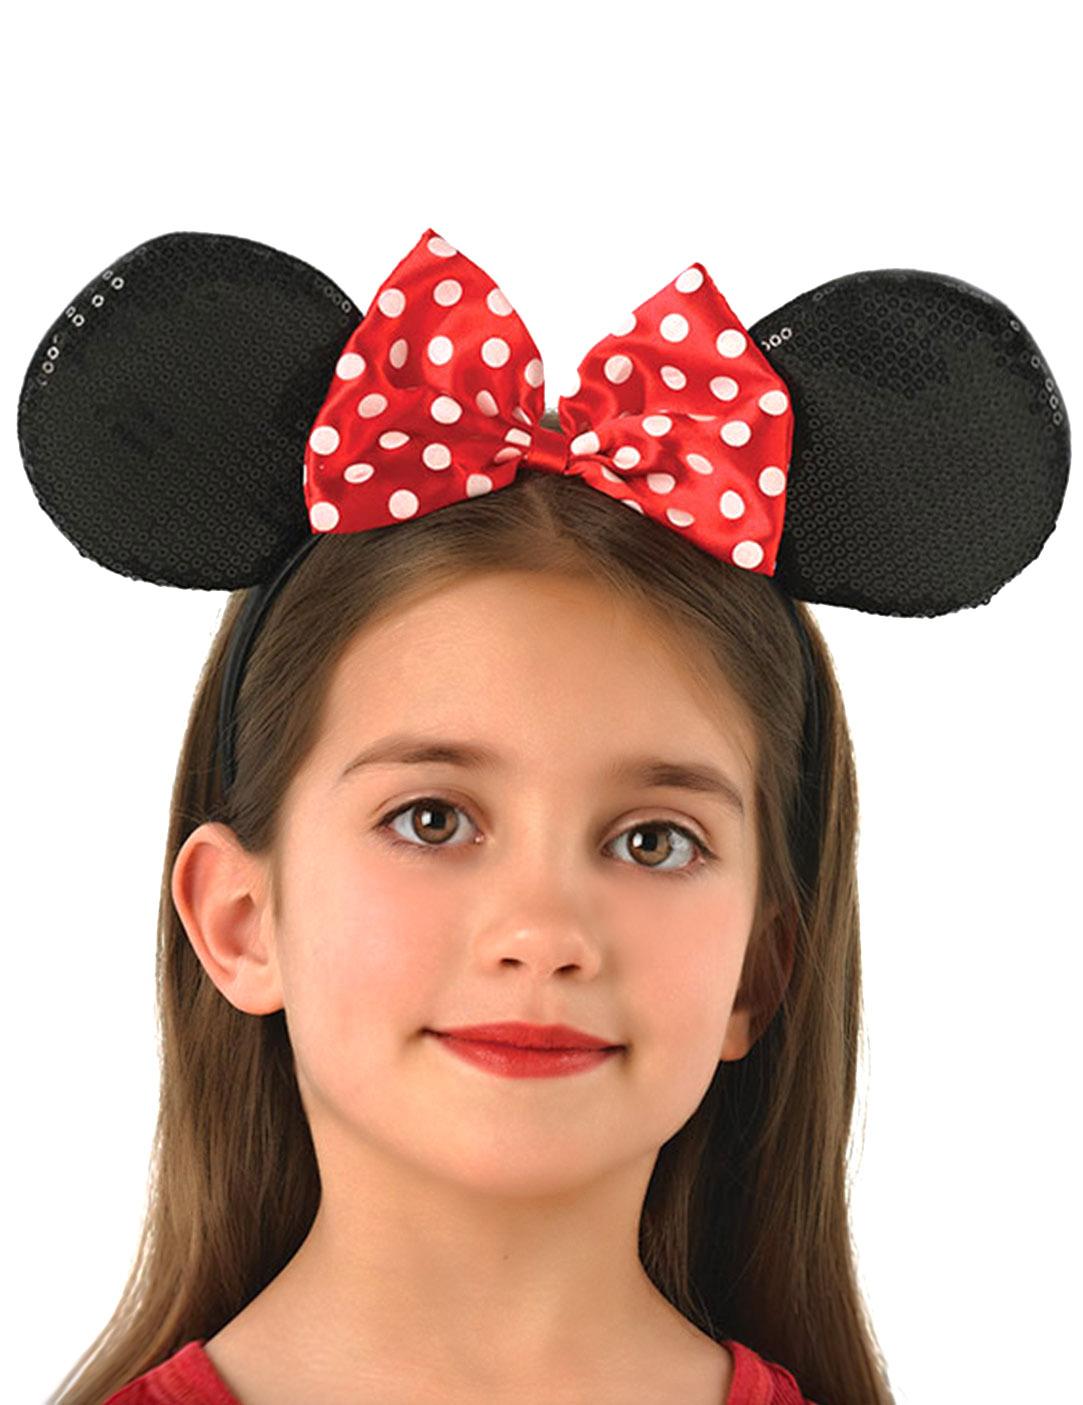 2ced7aaba03 Serre-tête Minnie™ enfant   Deguise-toi